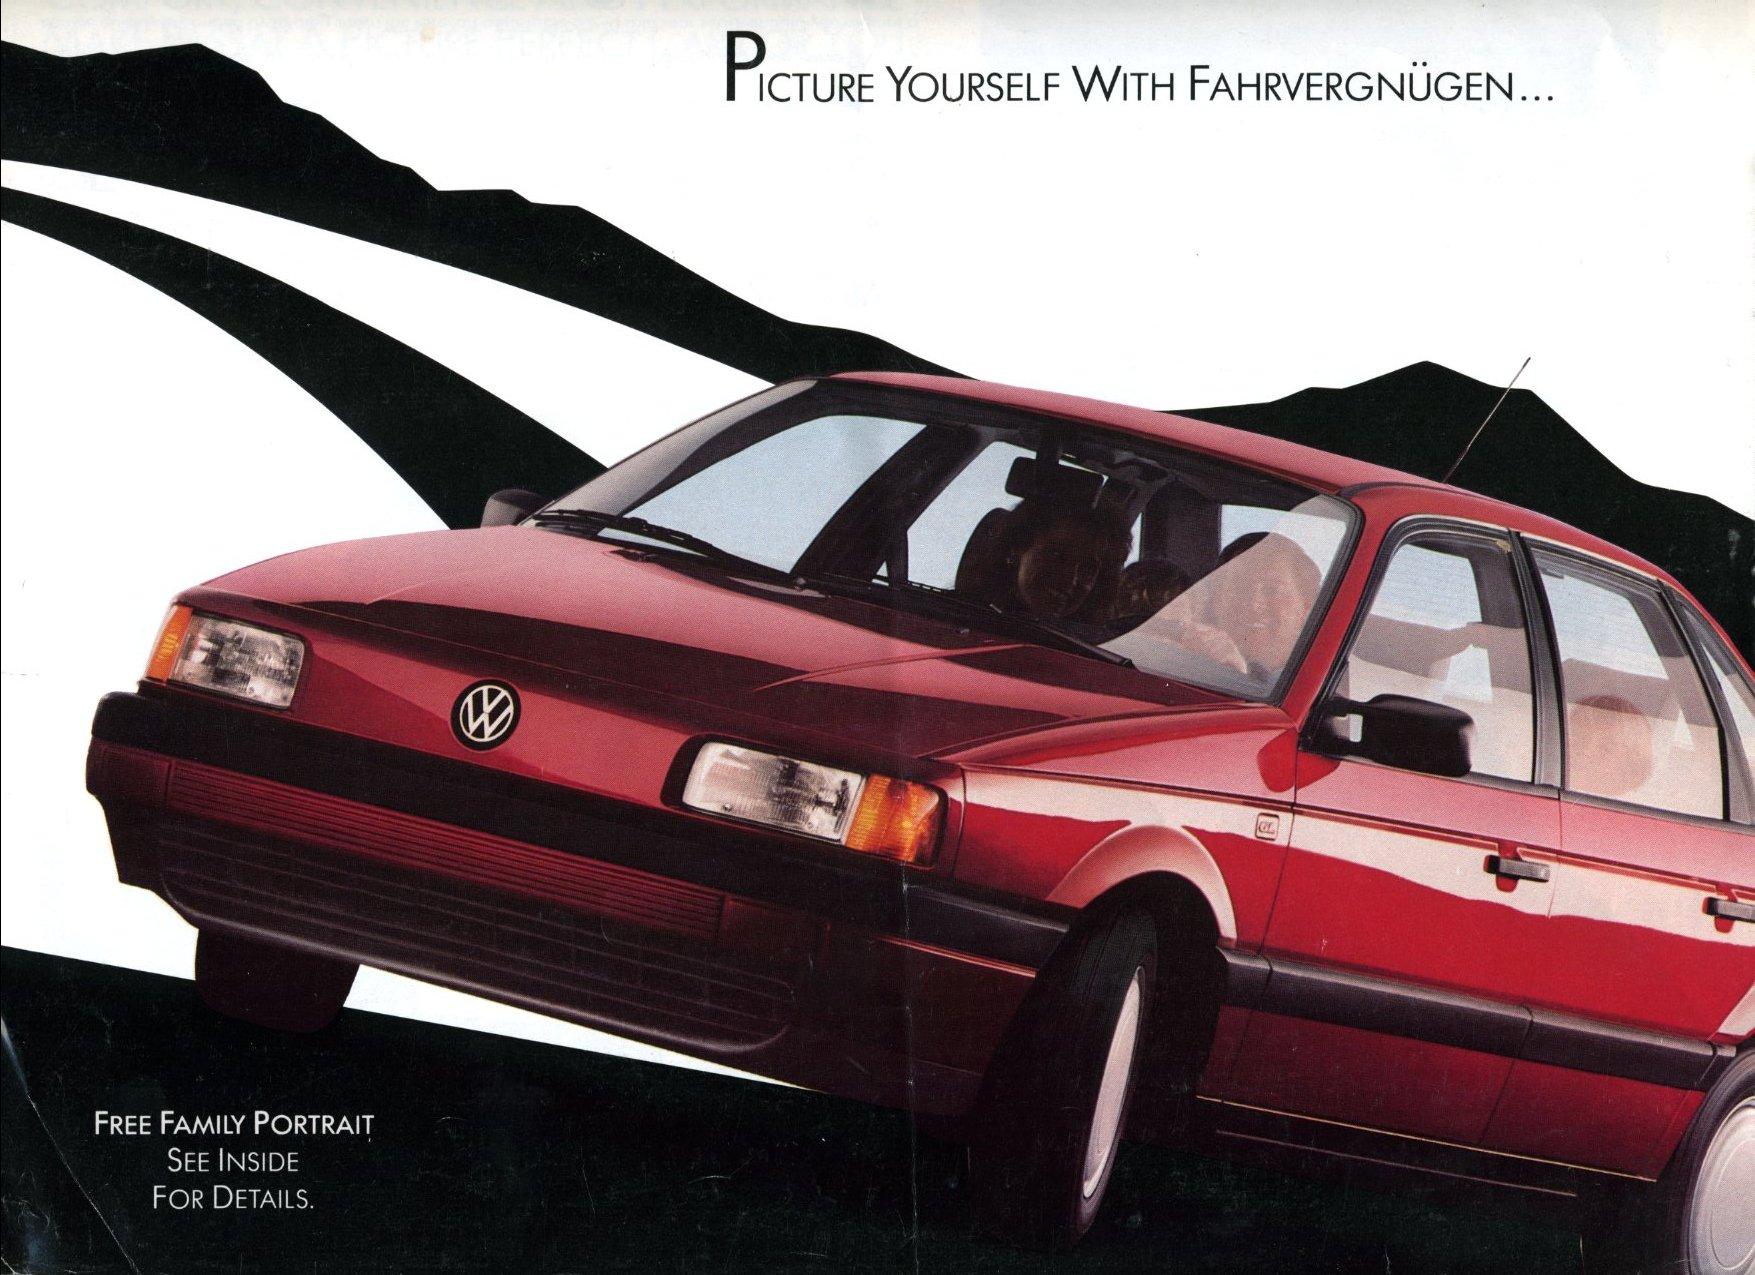 VWVortex.com - 1990 VW Passat Fahrvergnugen Brochure